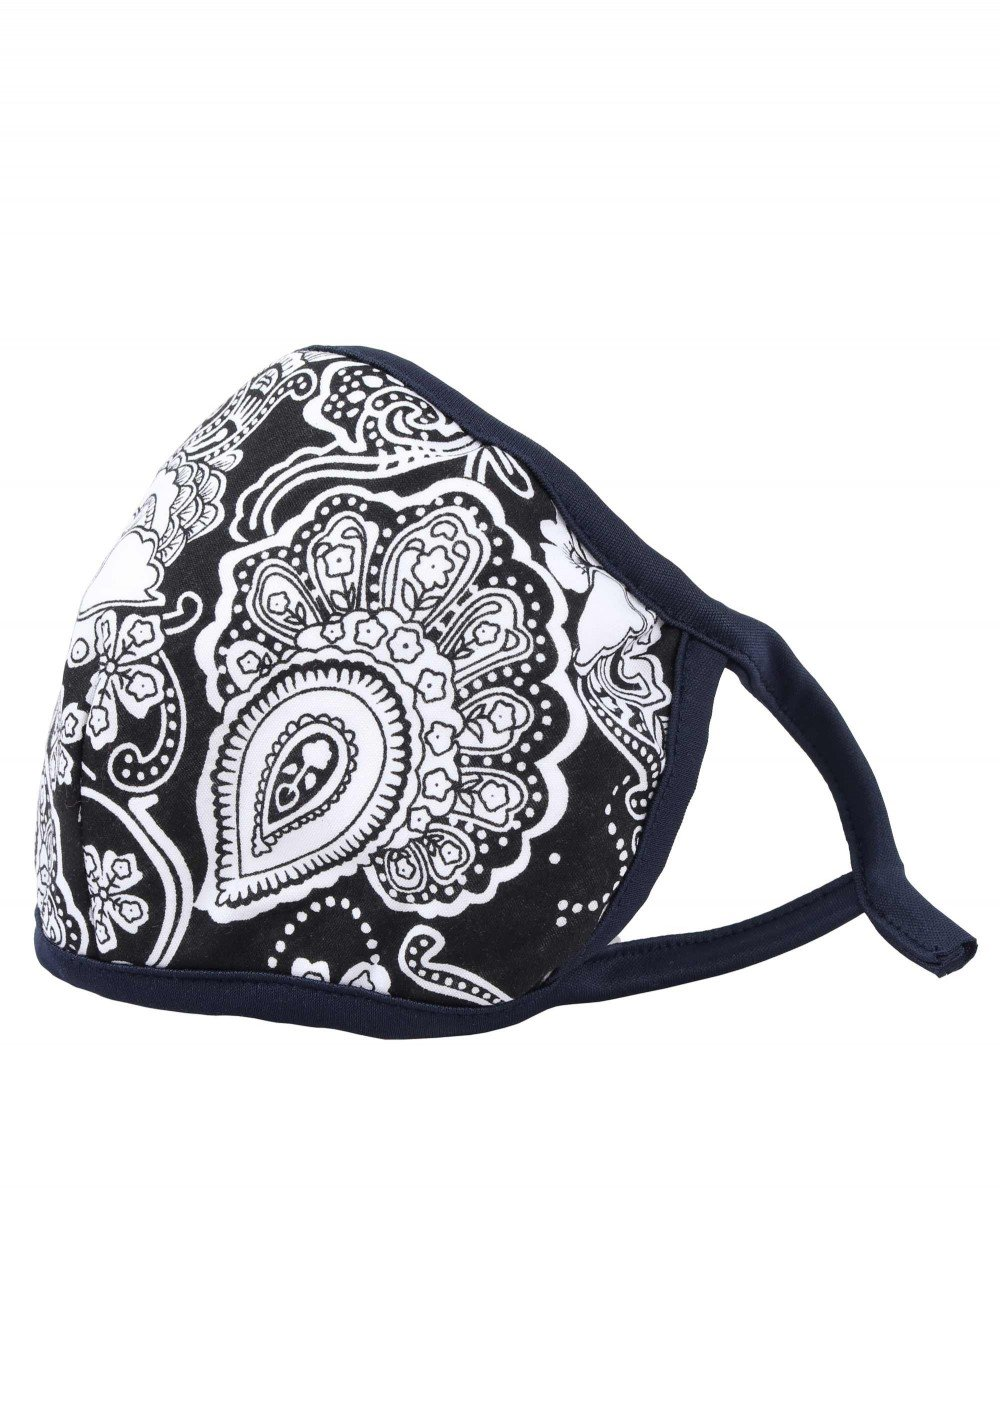 black white floral paisley filter mask